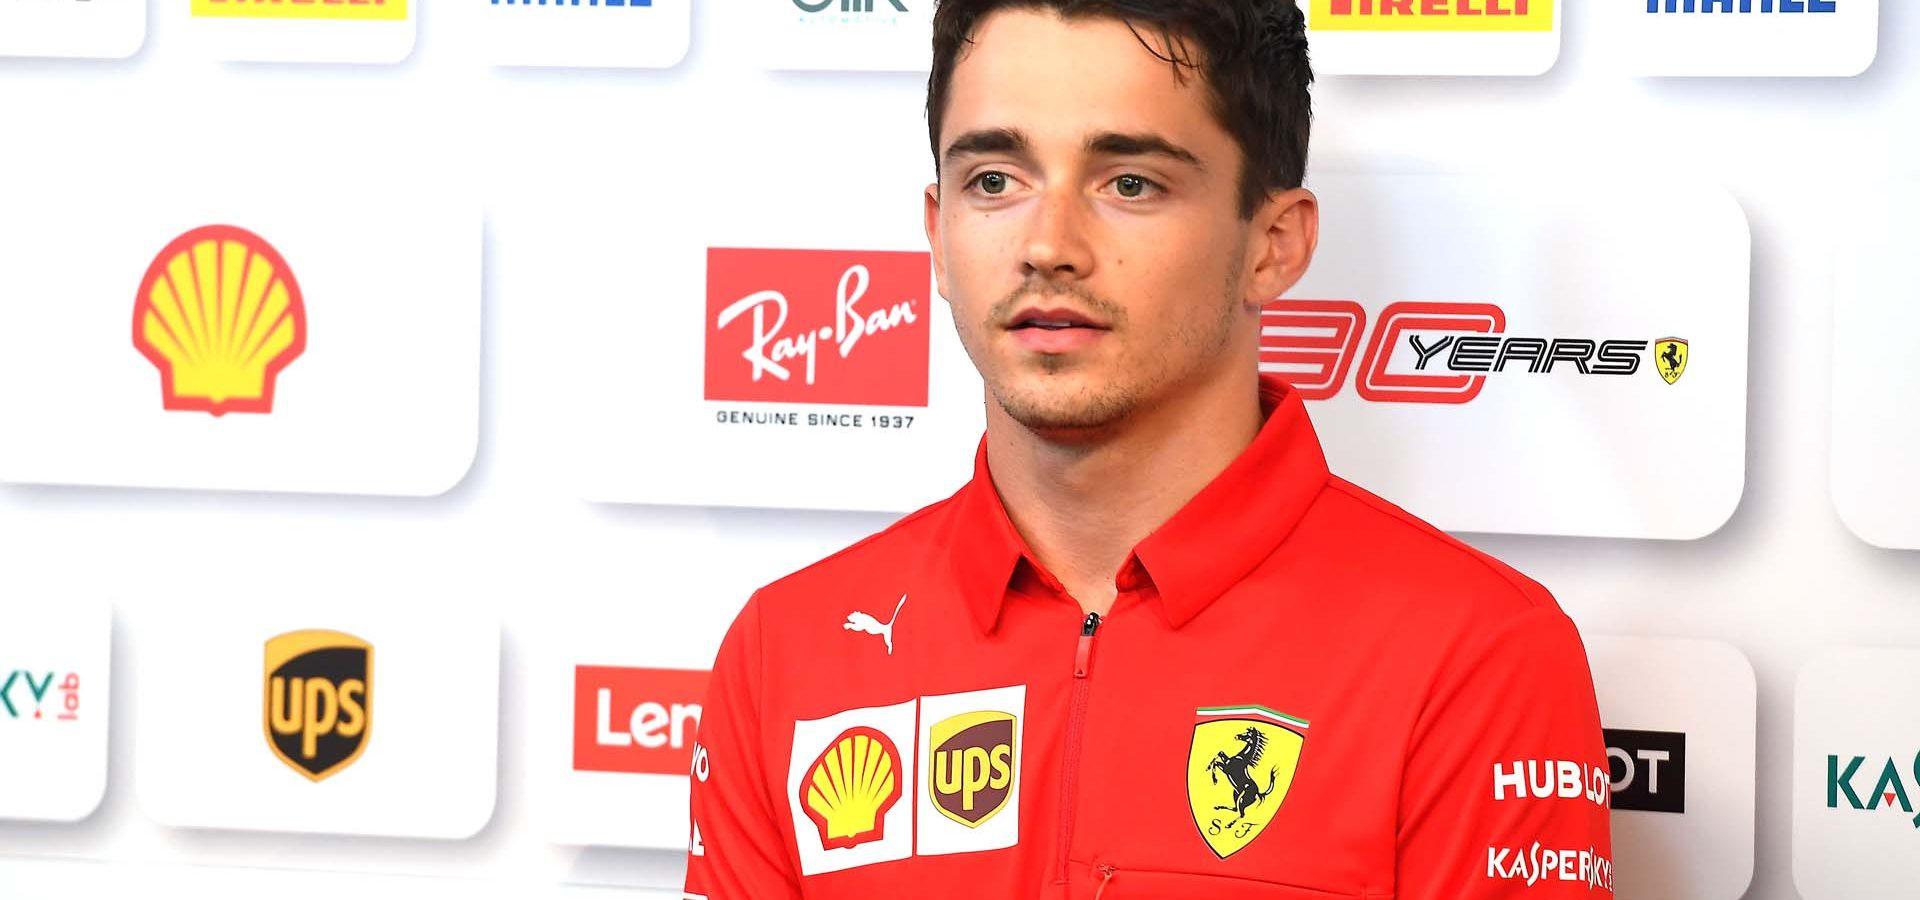 GP GRAN BRETAGNA F1/2019 - GIOVEDÌ 11/07/2019 credit: @Scuderia Ferrari Press Office Charles Leclerc